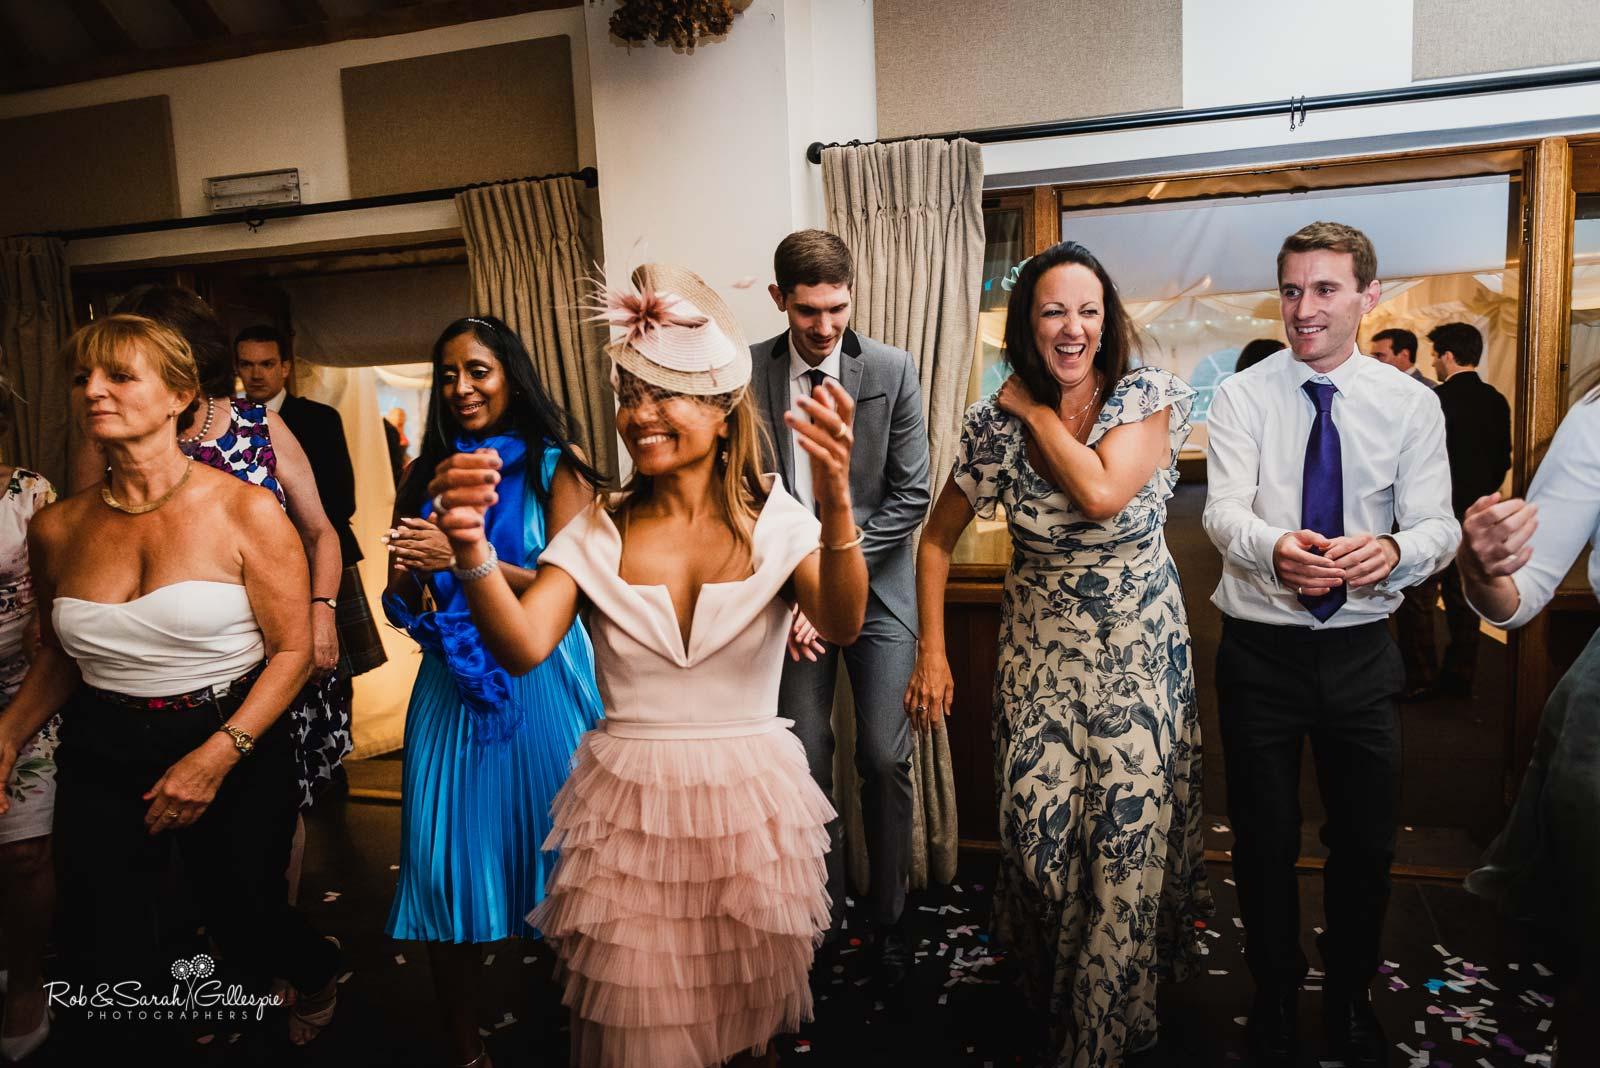 Ceilidh at Wethele Manor wedding